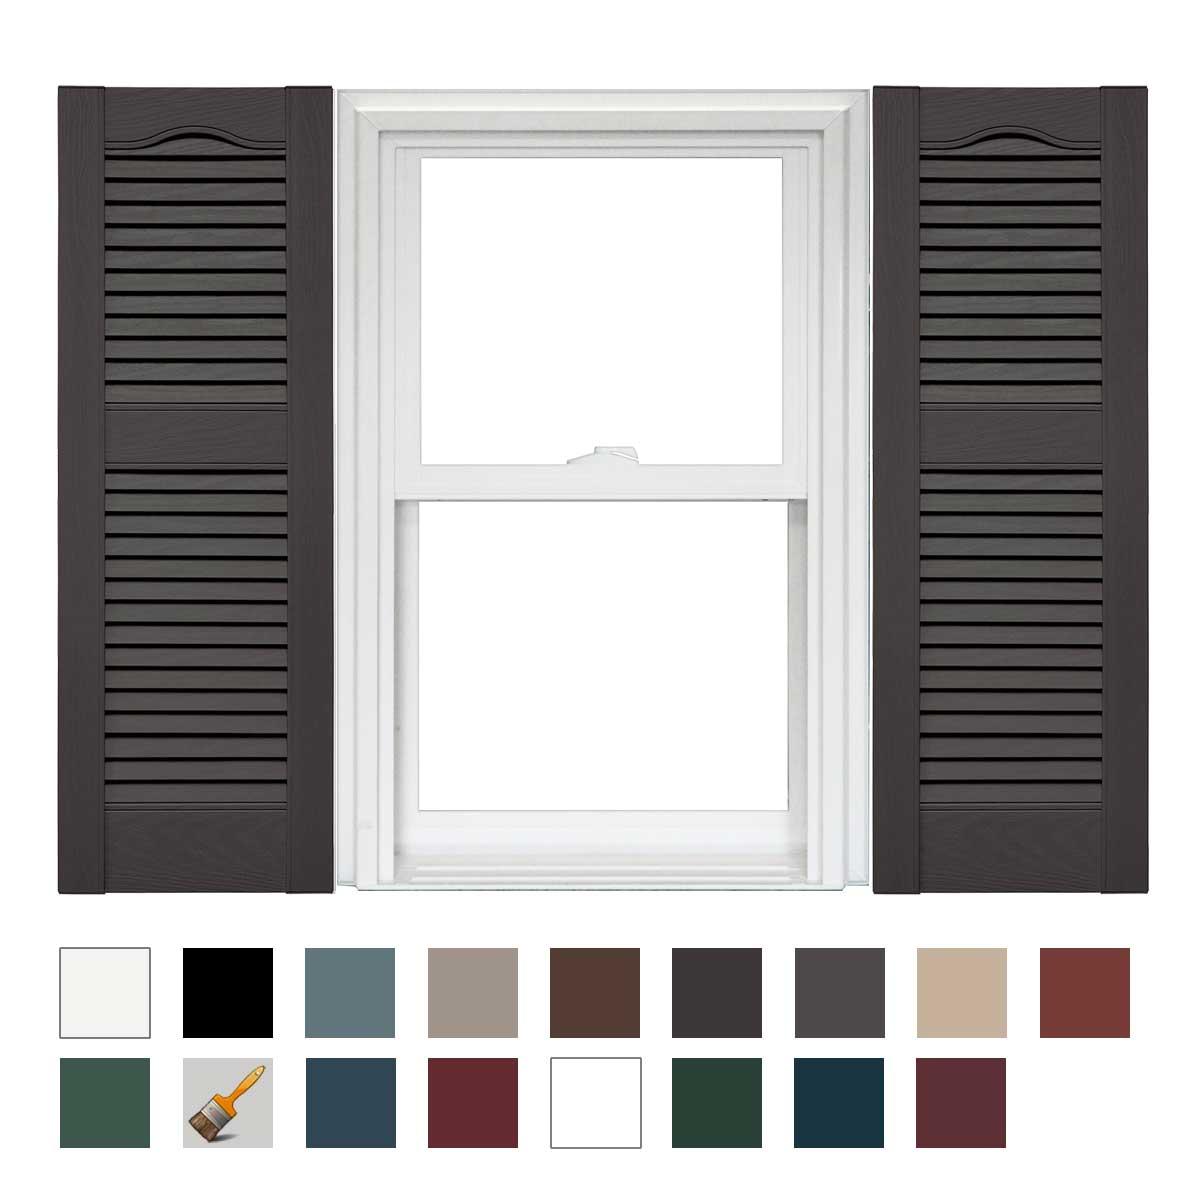 14.5 x 52 018 Tuxedo Gray